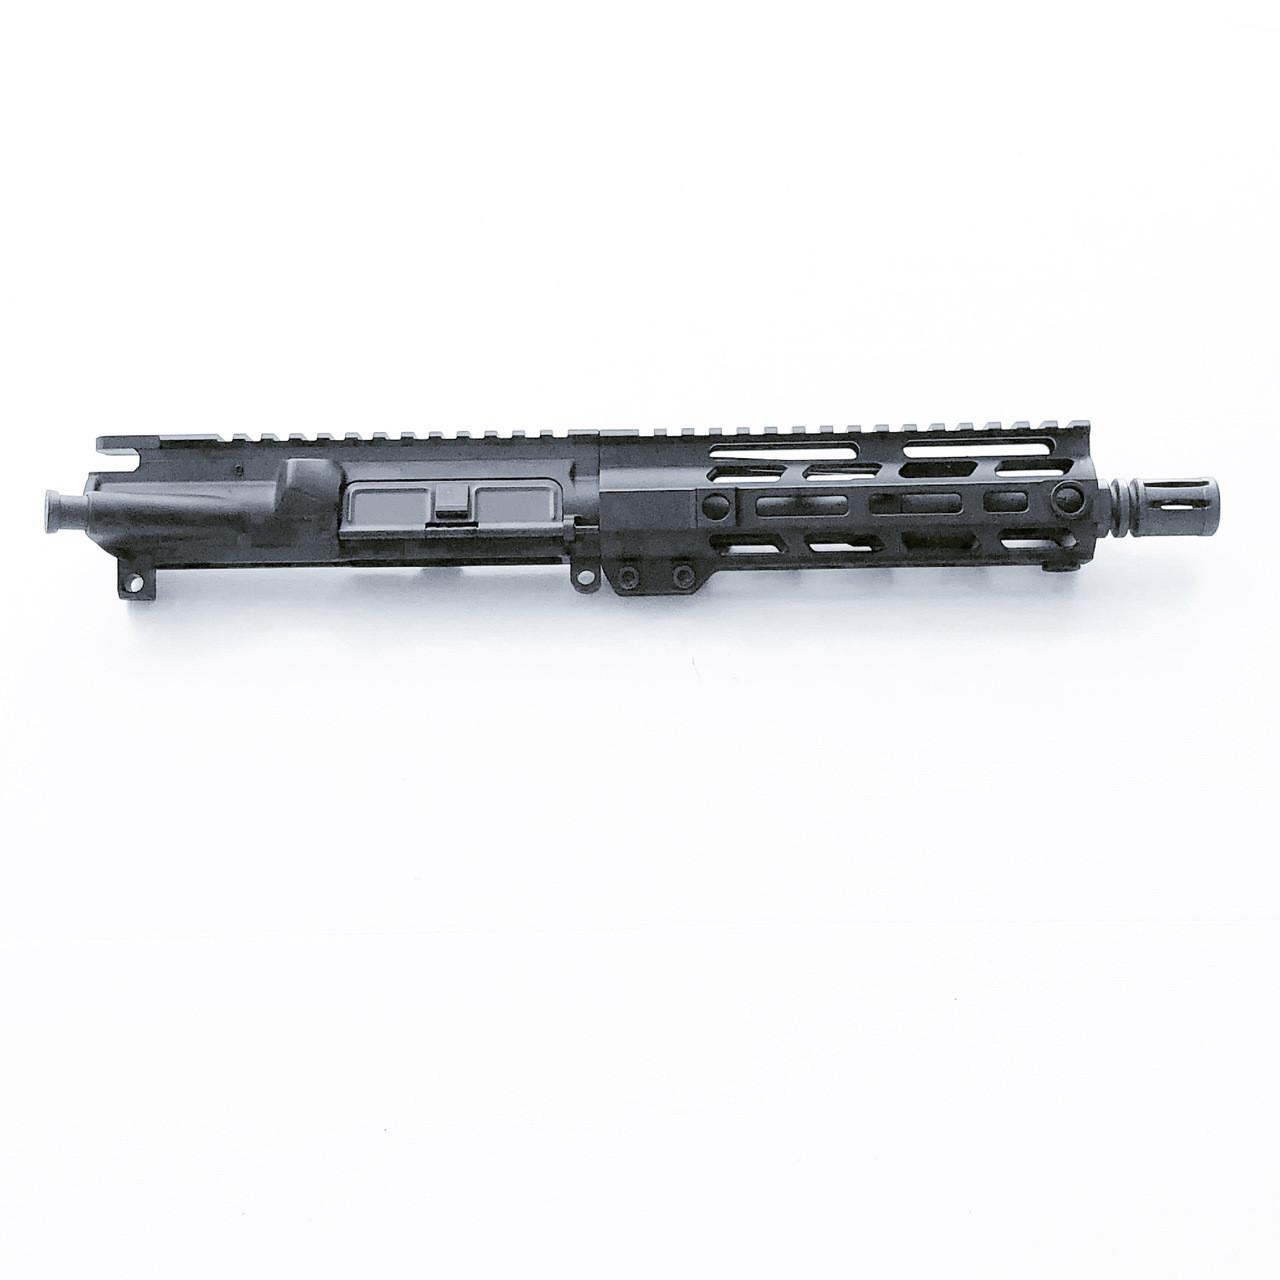 "AR-15 Pistol Upper, .300 Blackout, 7.5"" Barrel, 1:8 Twist, Pistol Gas System"